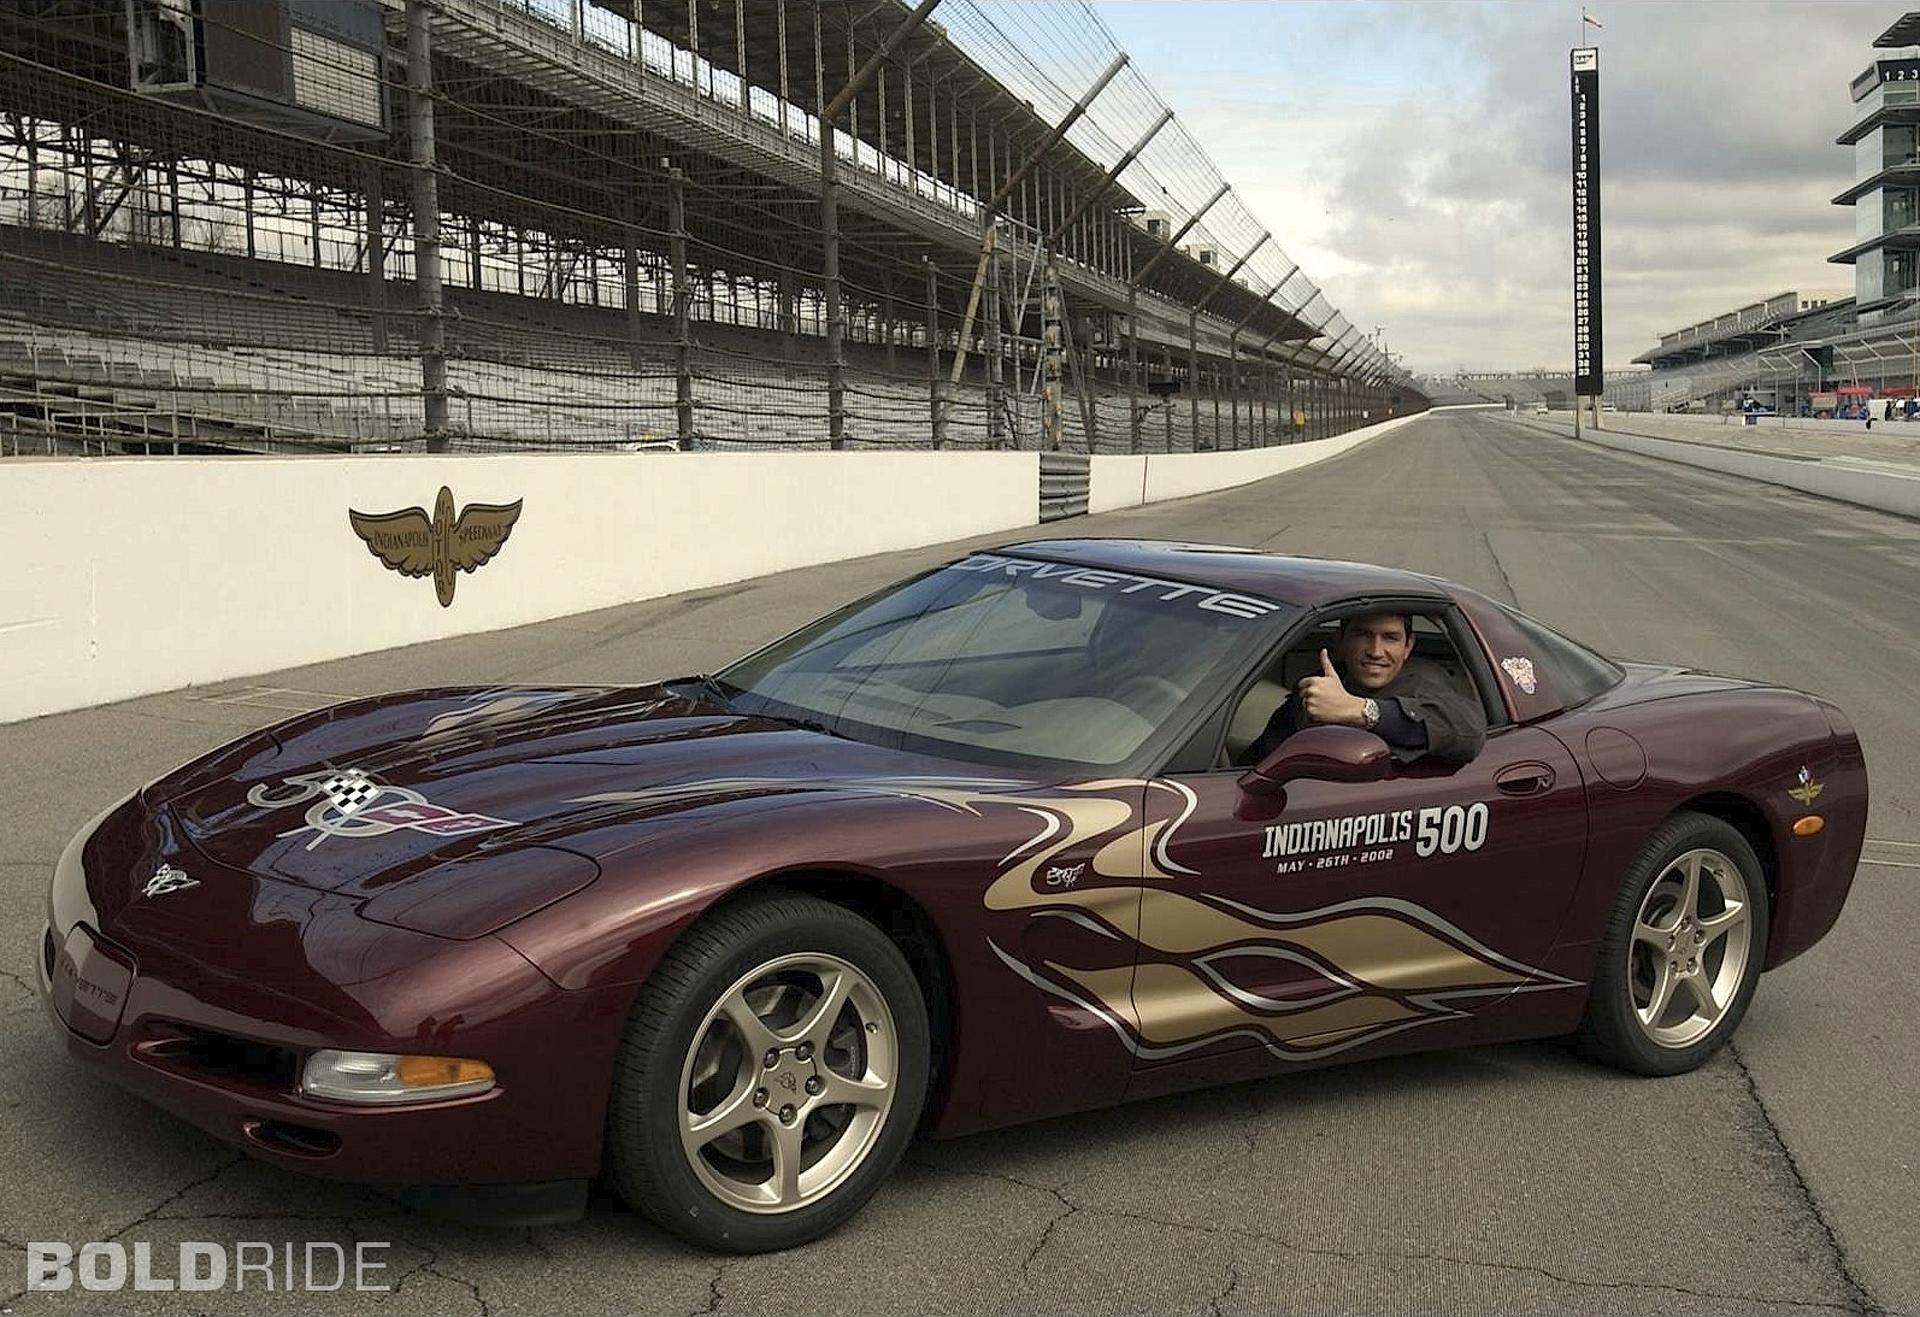 chevrolet corvette indy 500 pace car. Black Bedroom Furniture Sets. Home Design Ideas